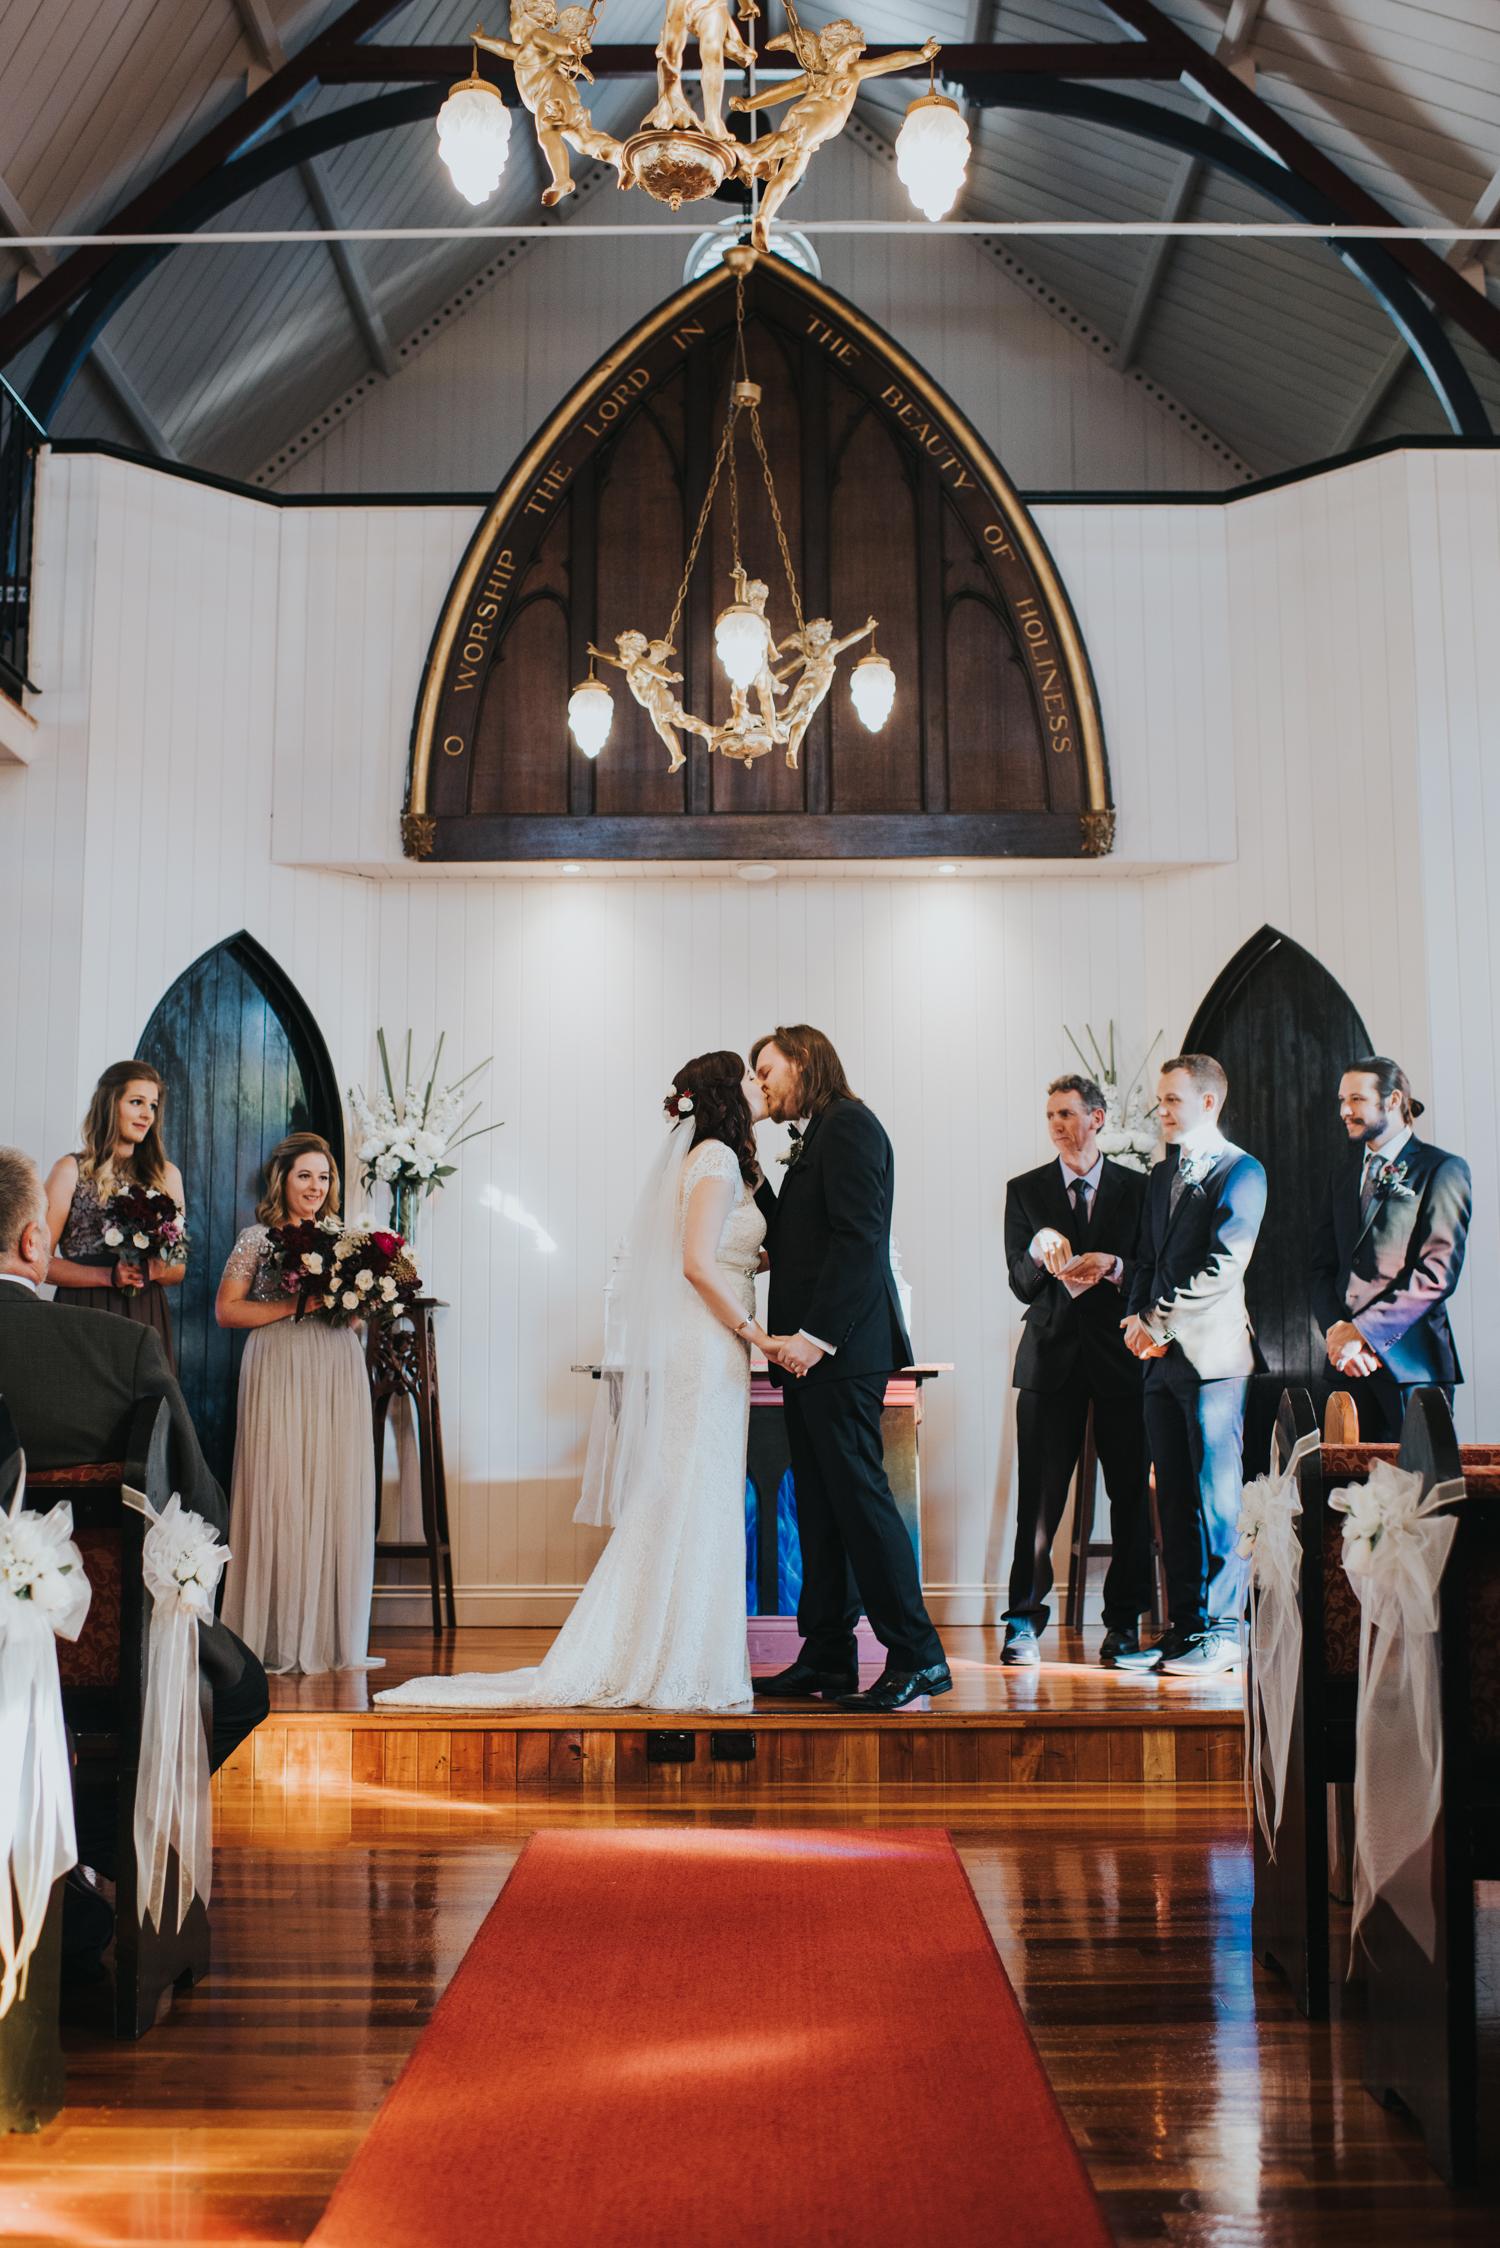 Brisbane Wedding Photographer | Elopement-Engagement Photographer-22.jpg